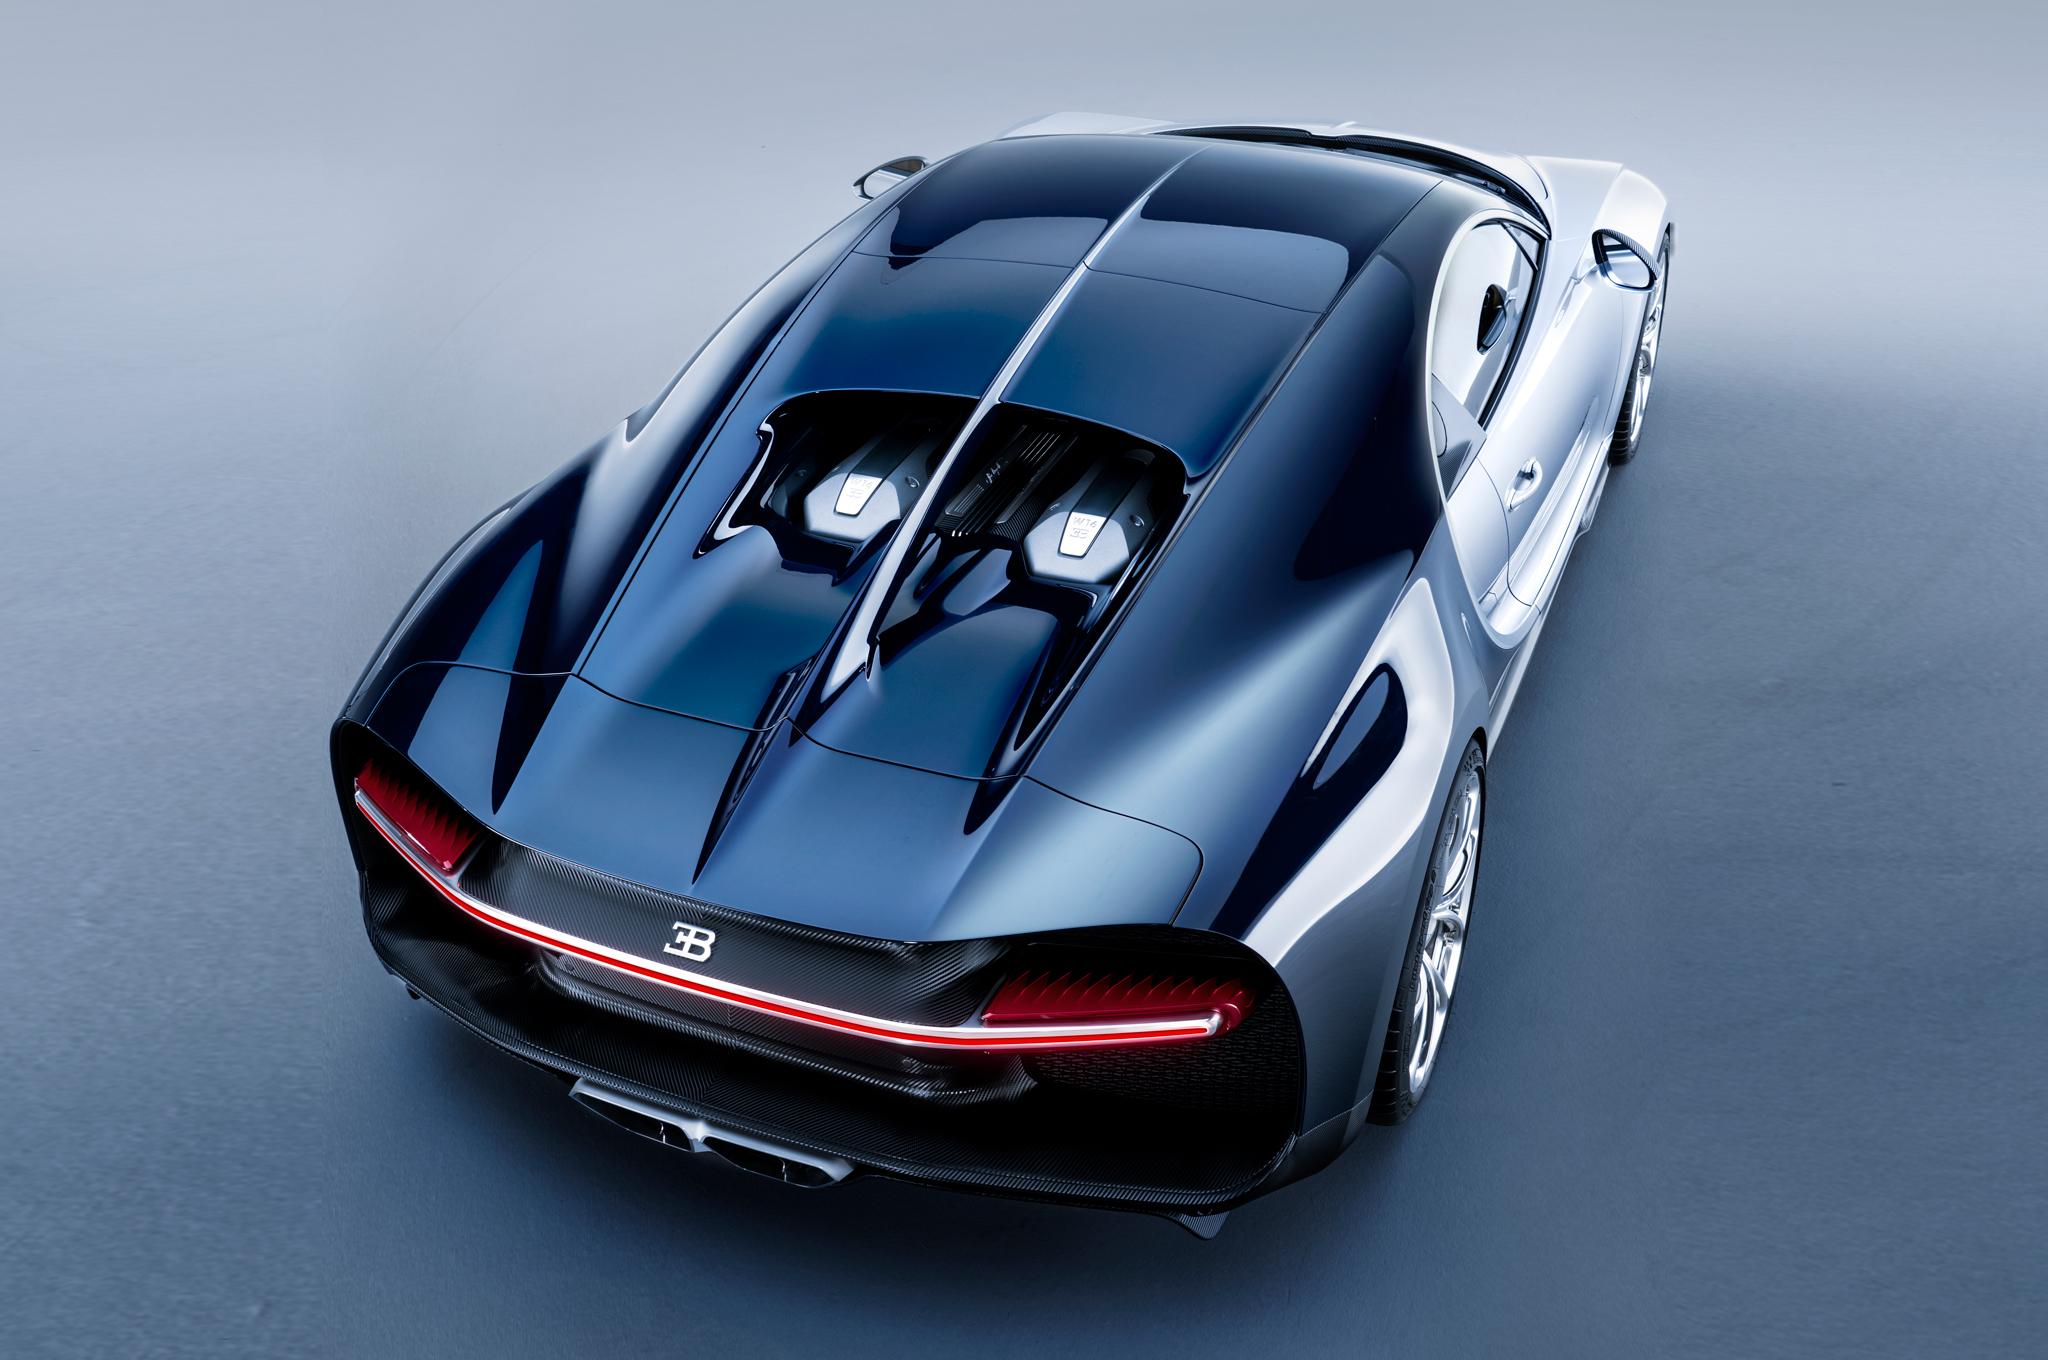 2017-Bugatti-Chiron-rear-top-view.jpg